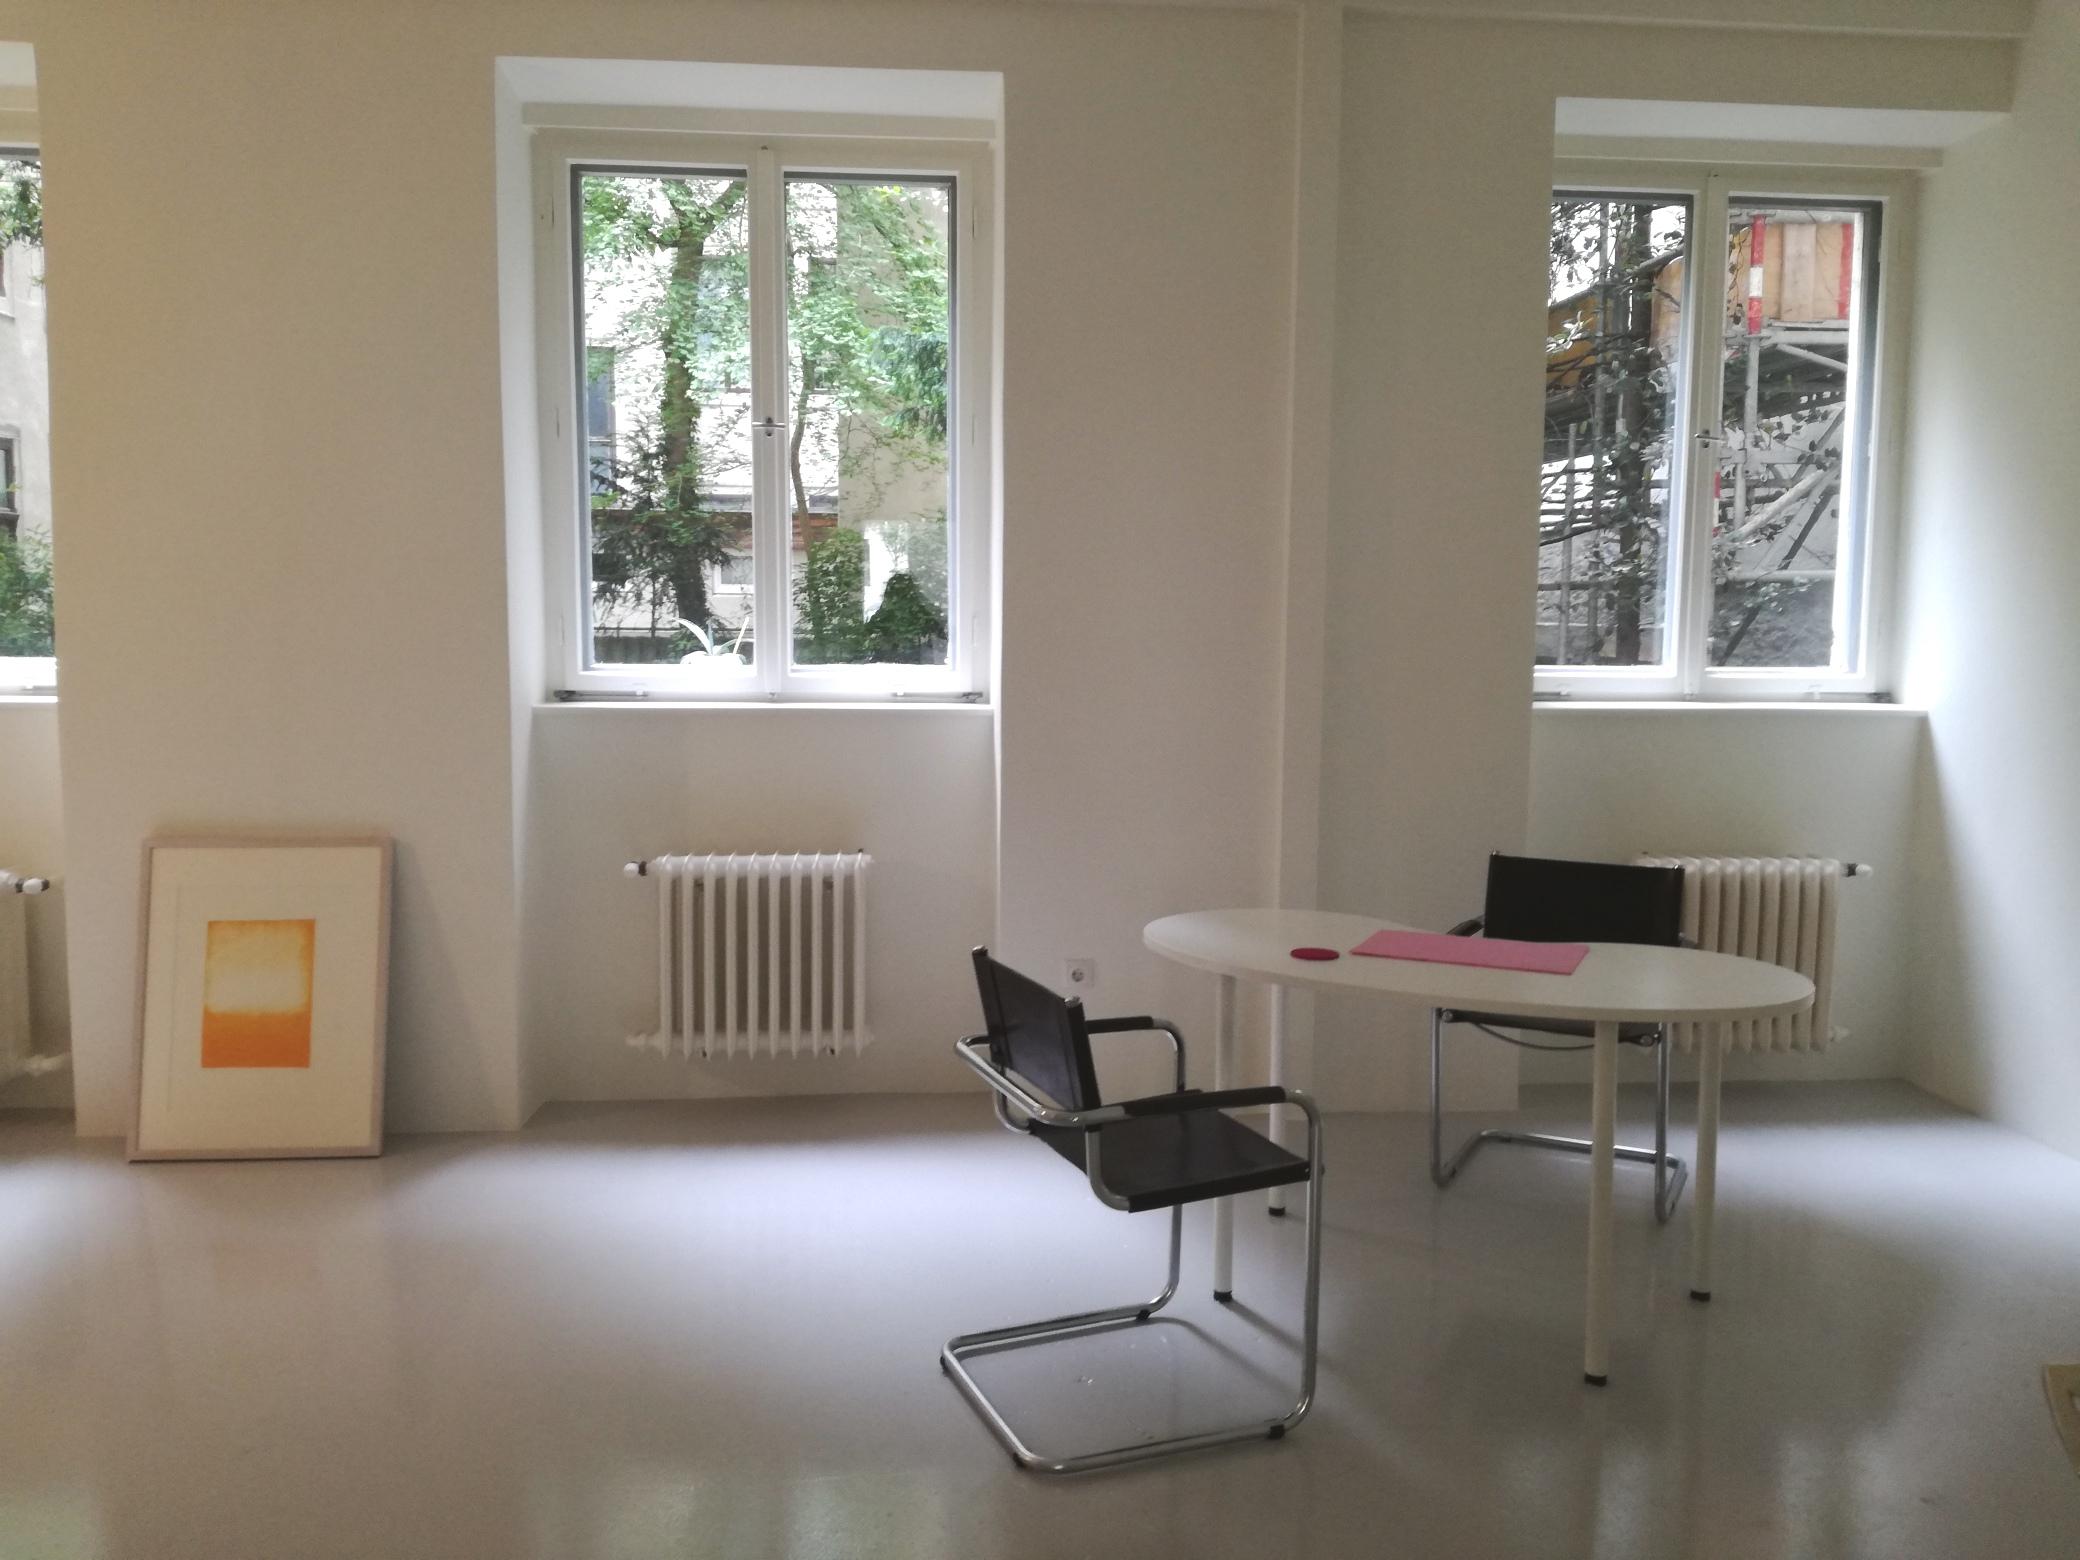 Büro/Studio/Atelier in zentrumsnaher Traumlage